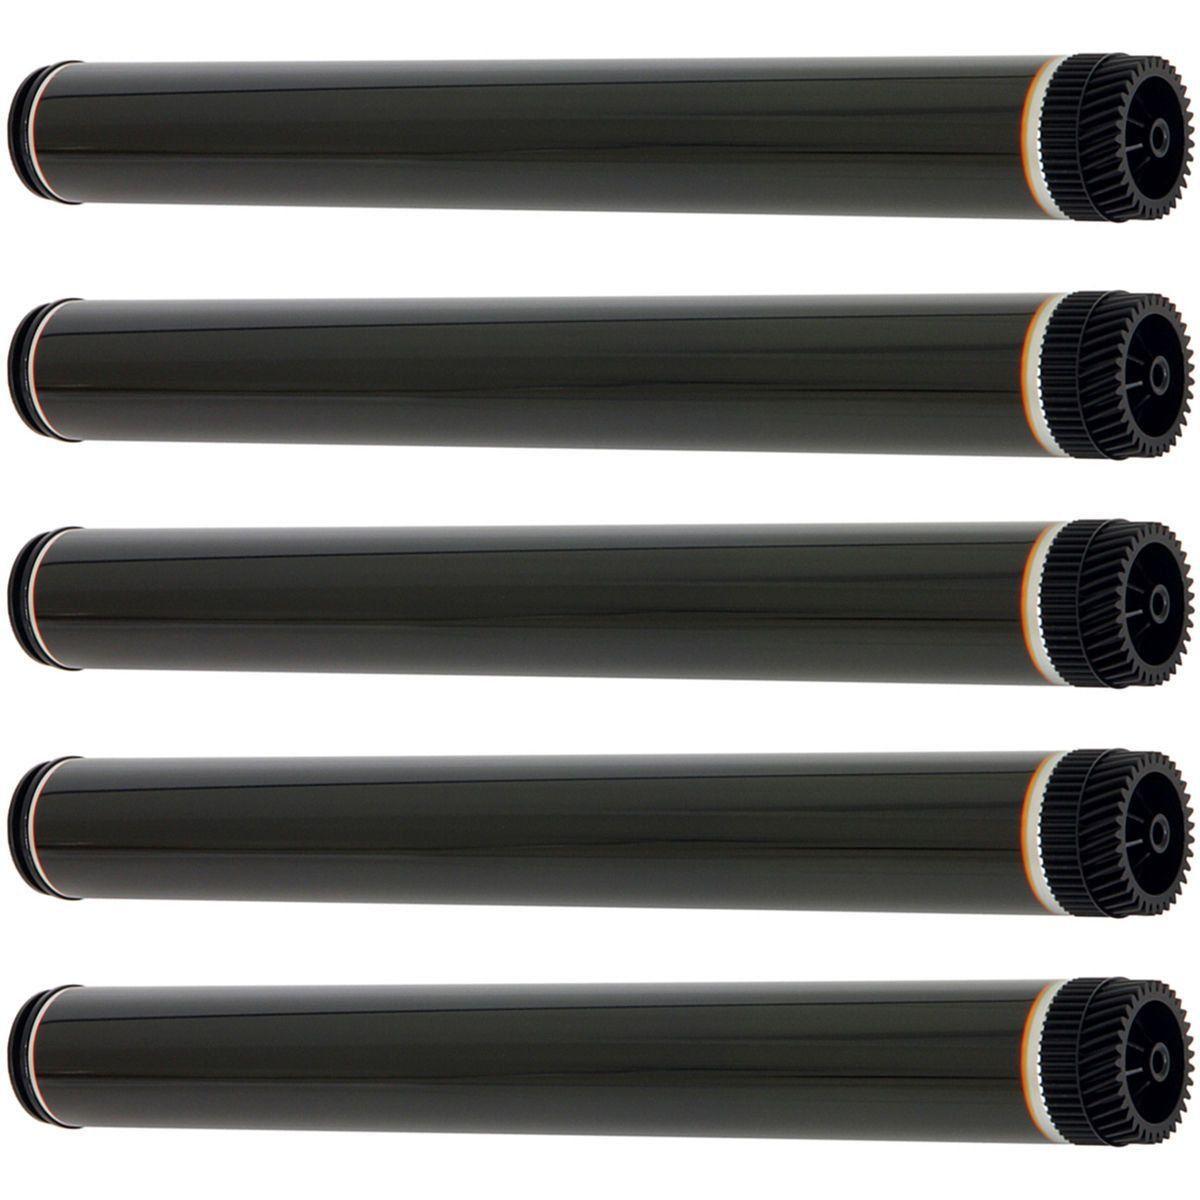 kit 5x / Cilindro para Fotocondutor Brother DR660 / L2320 L2720 L2740 L2700 L2520 L2320D L2360DW L2360 / Preto / 10.000